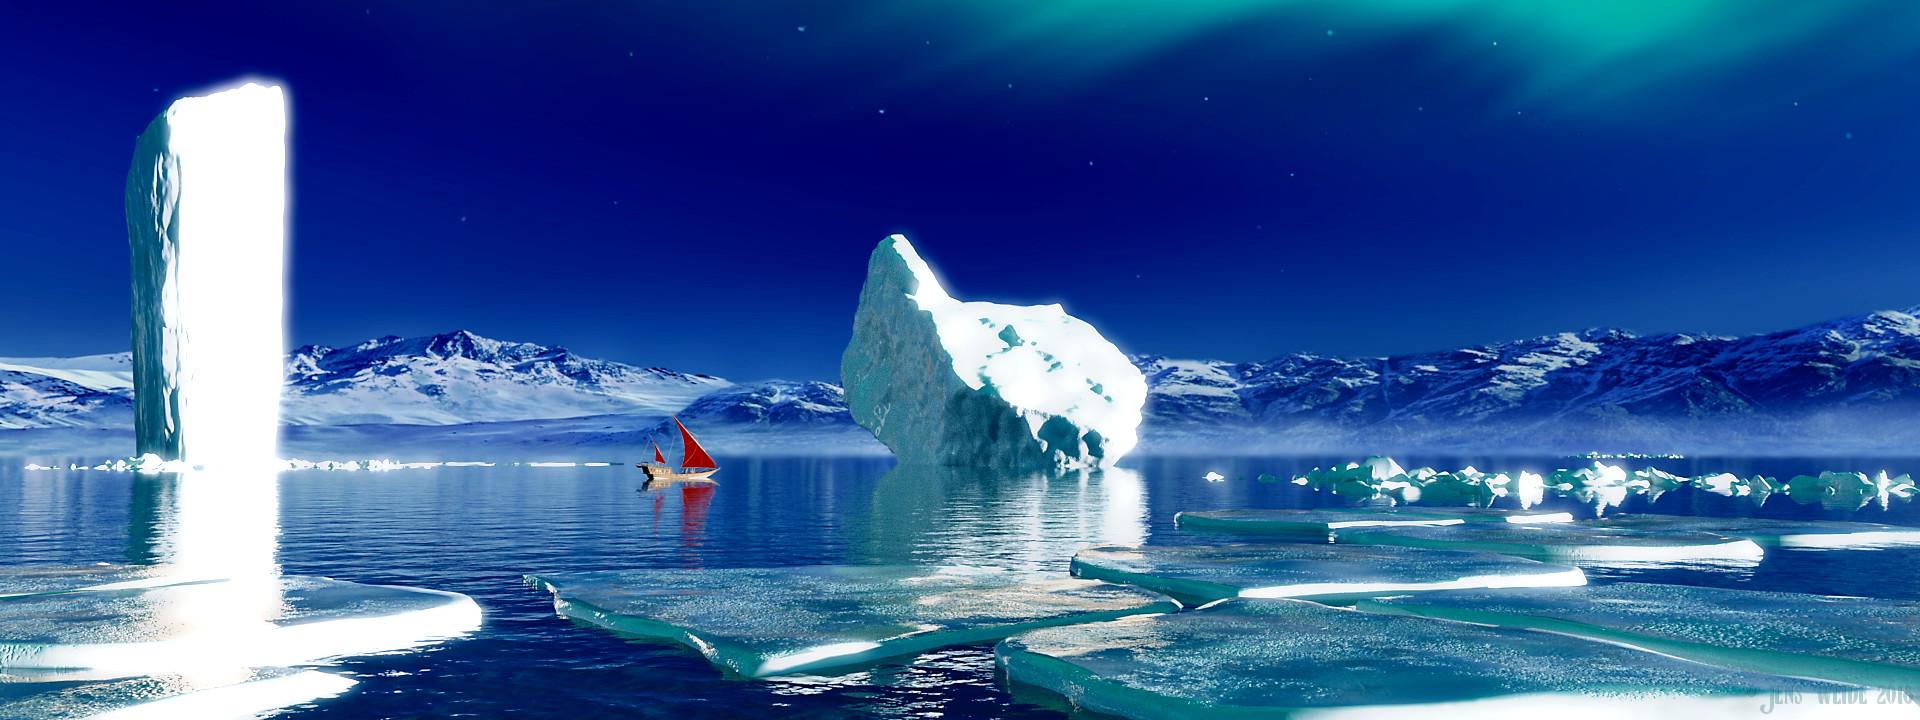 Iceland by JensDD